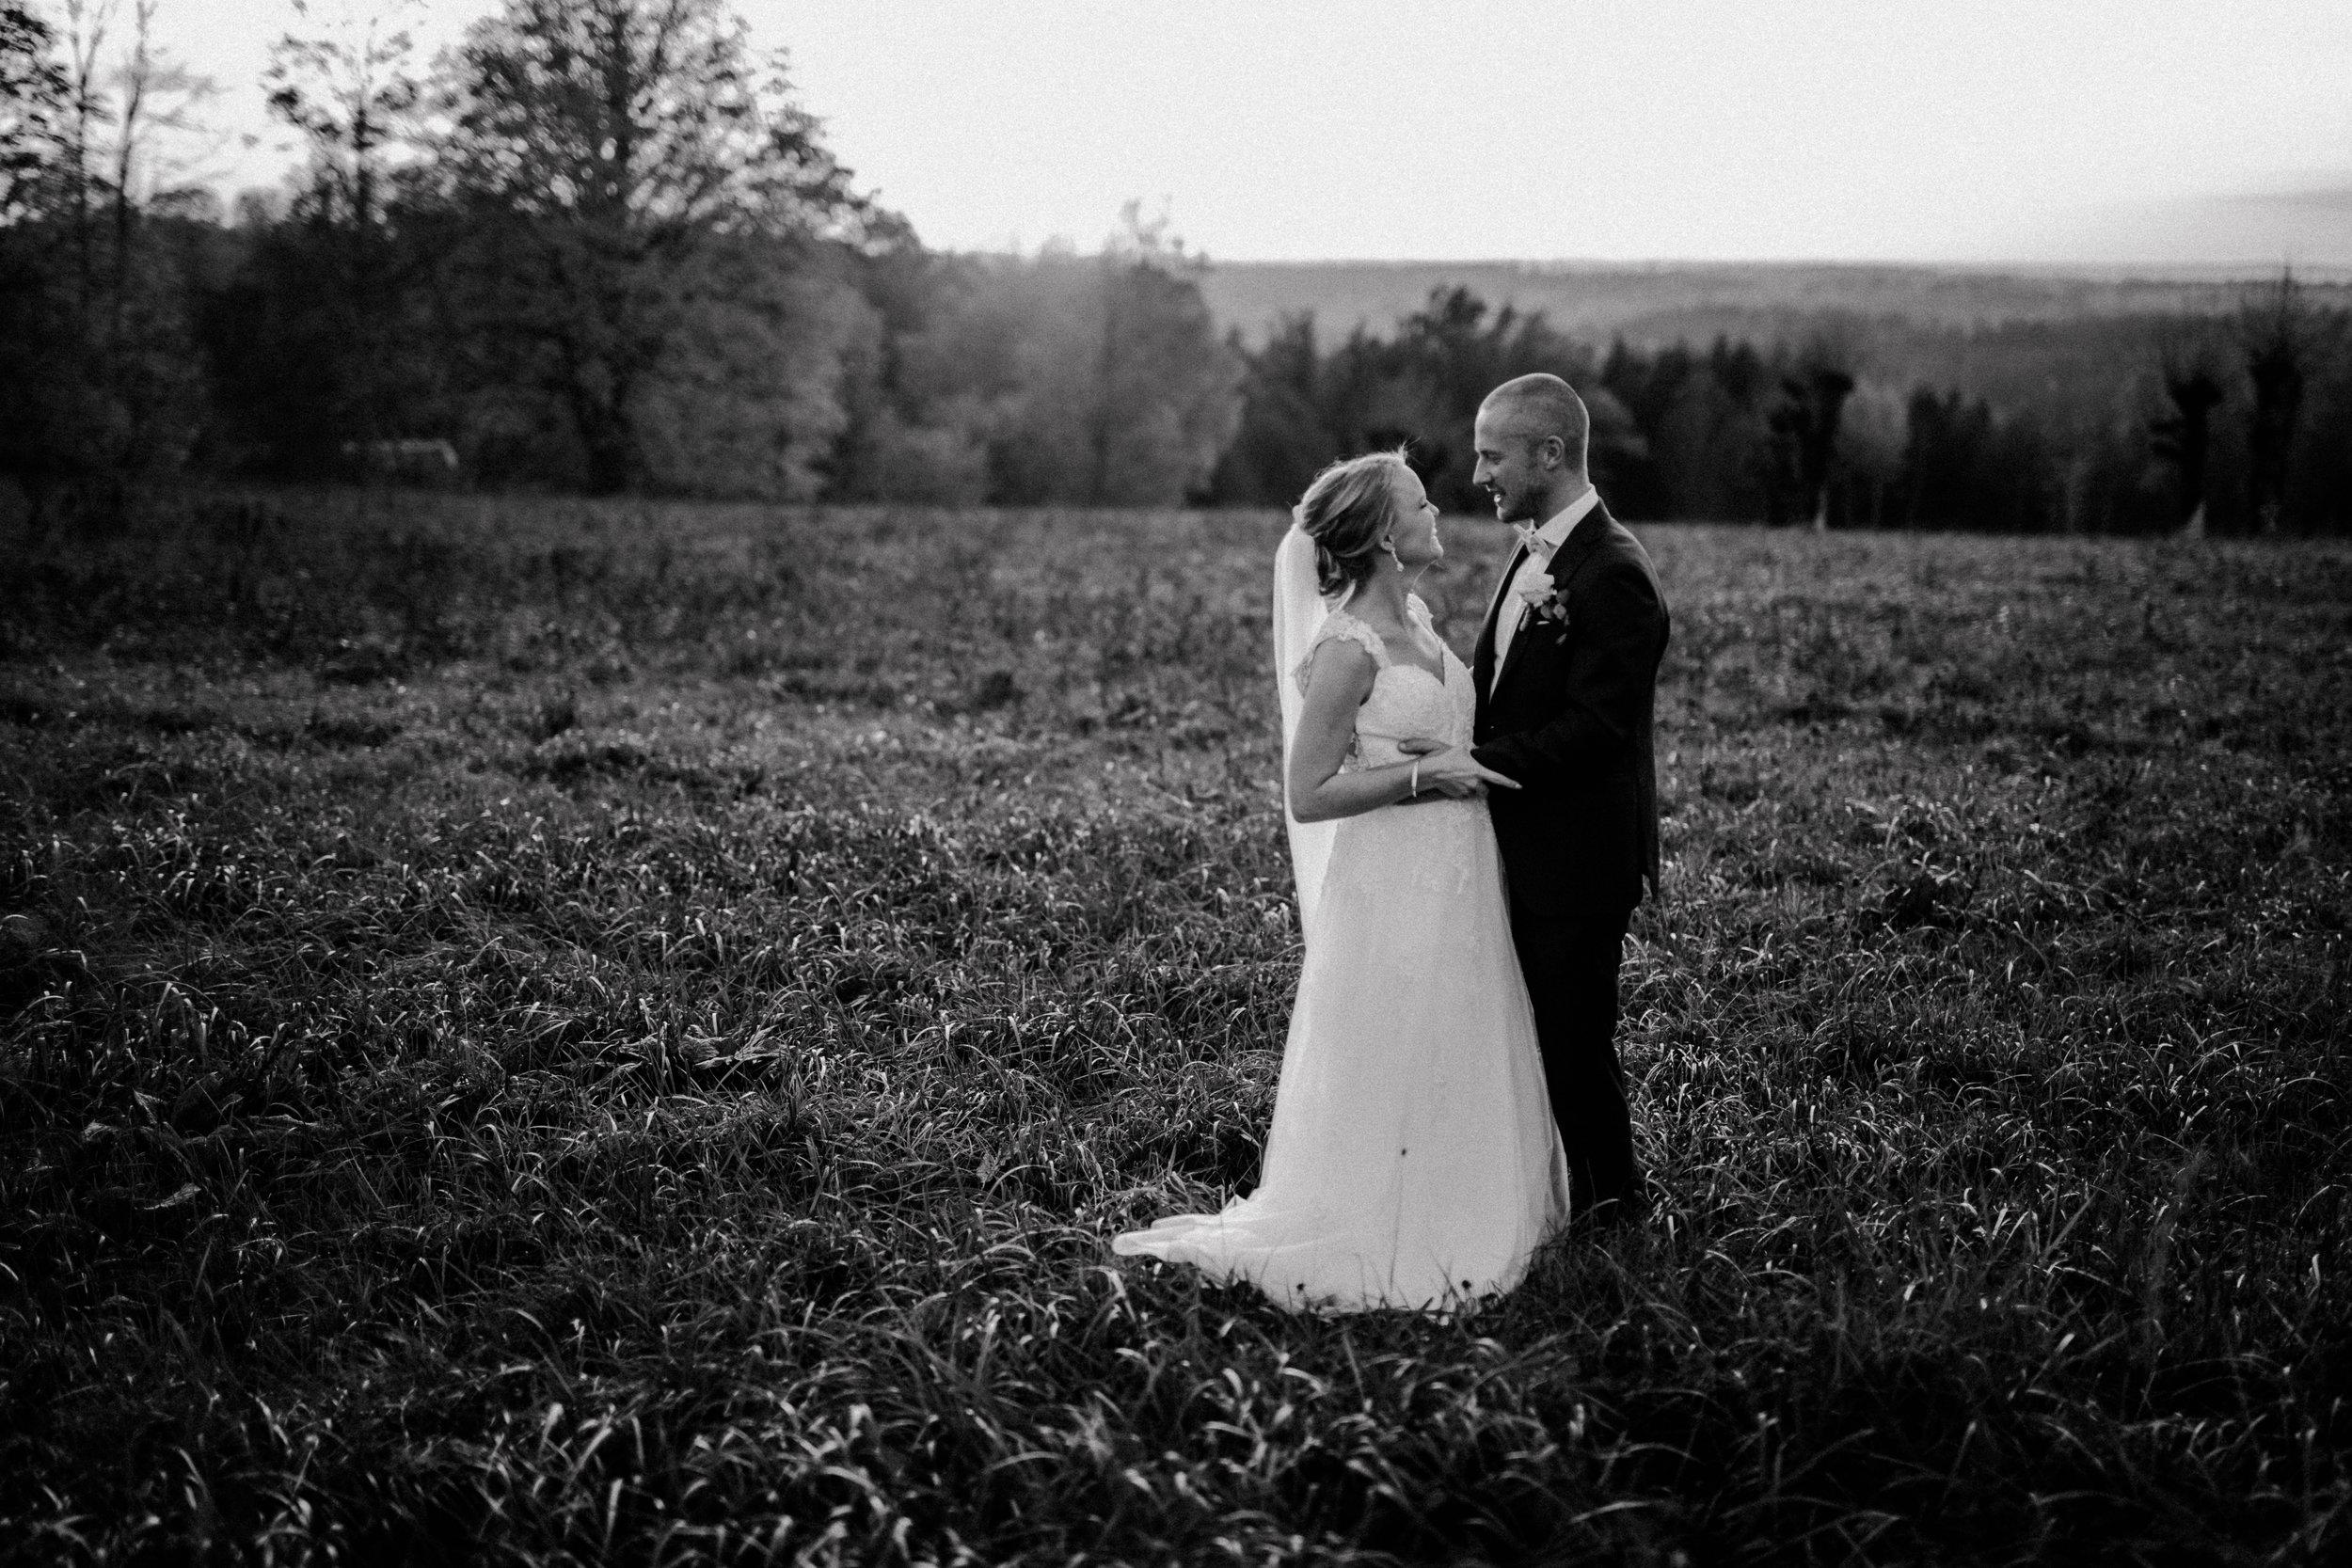 Bröllopsfotograf-Uddetorp Säteri-Höstbröllop-Fotograf Emilia- Bröllopsfotograf Borås-63.jpg